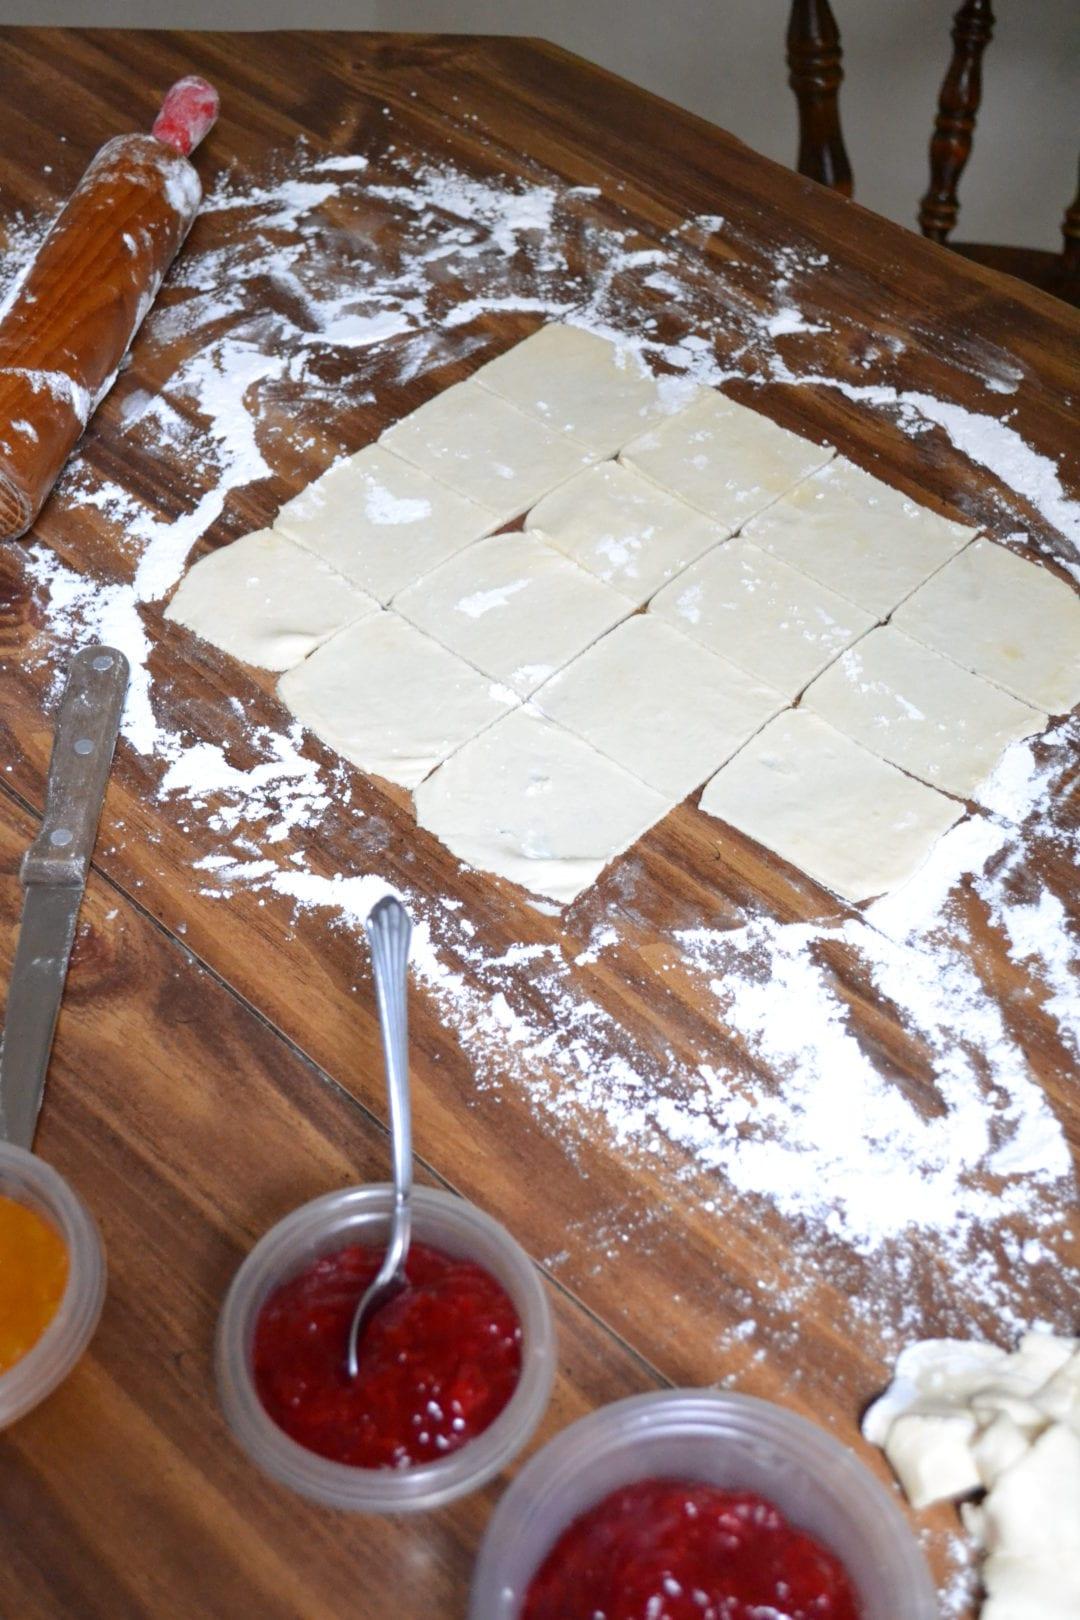 Kolaczki sarcastic cooking i ccuart Choice Image